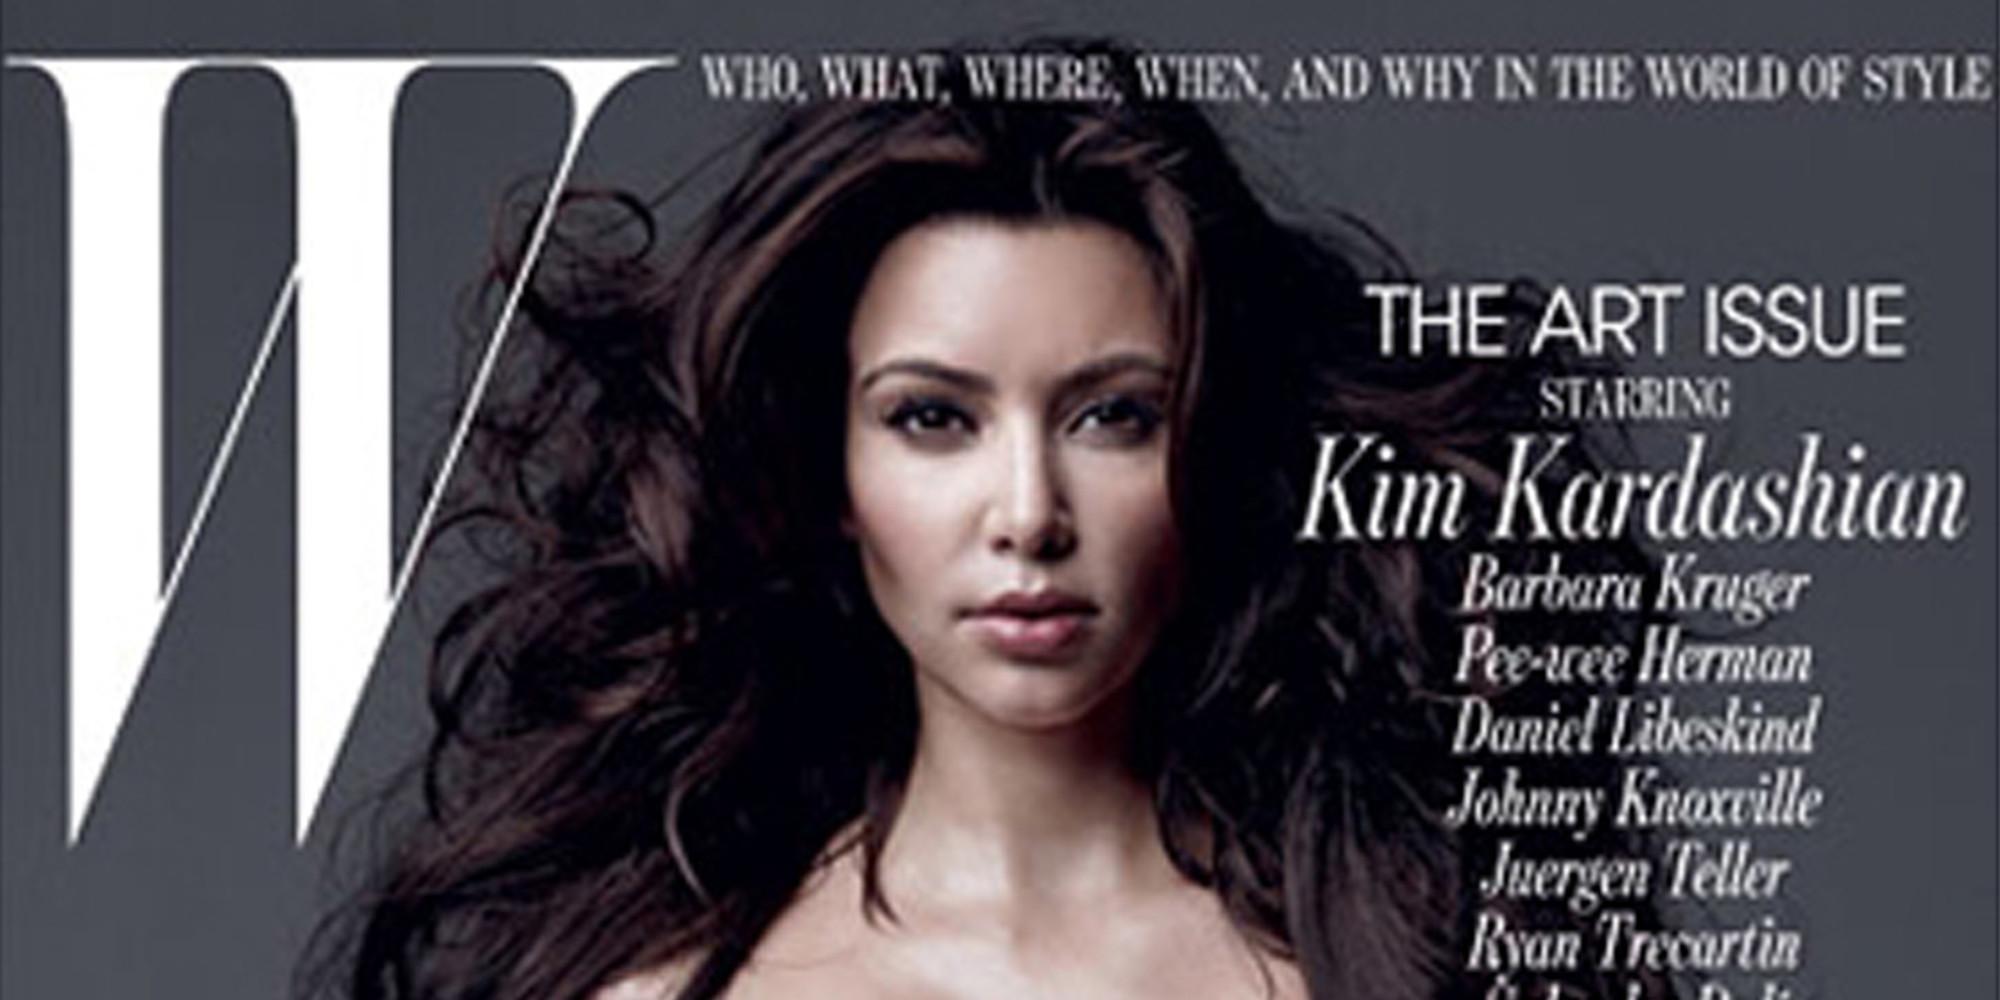 With Kim kardashian w cover for that